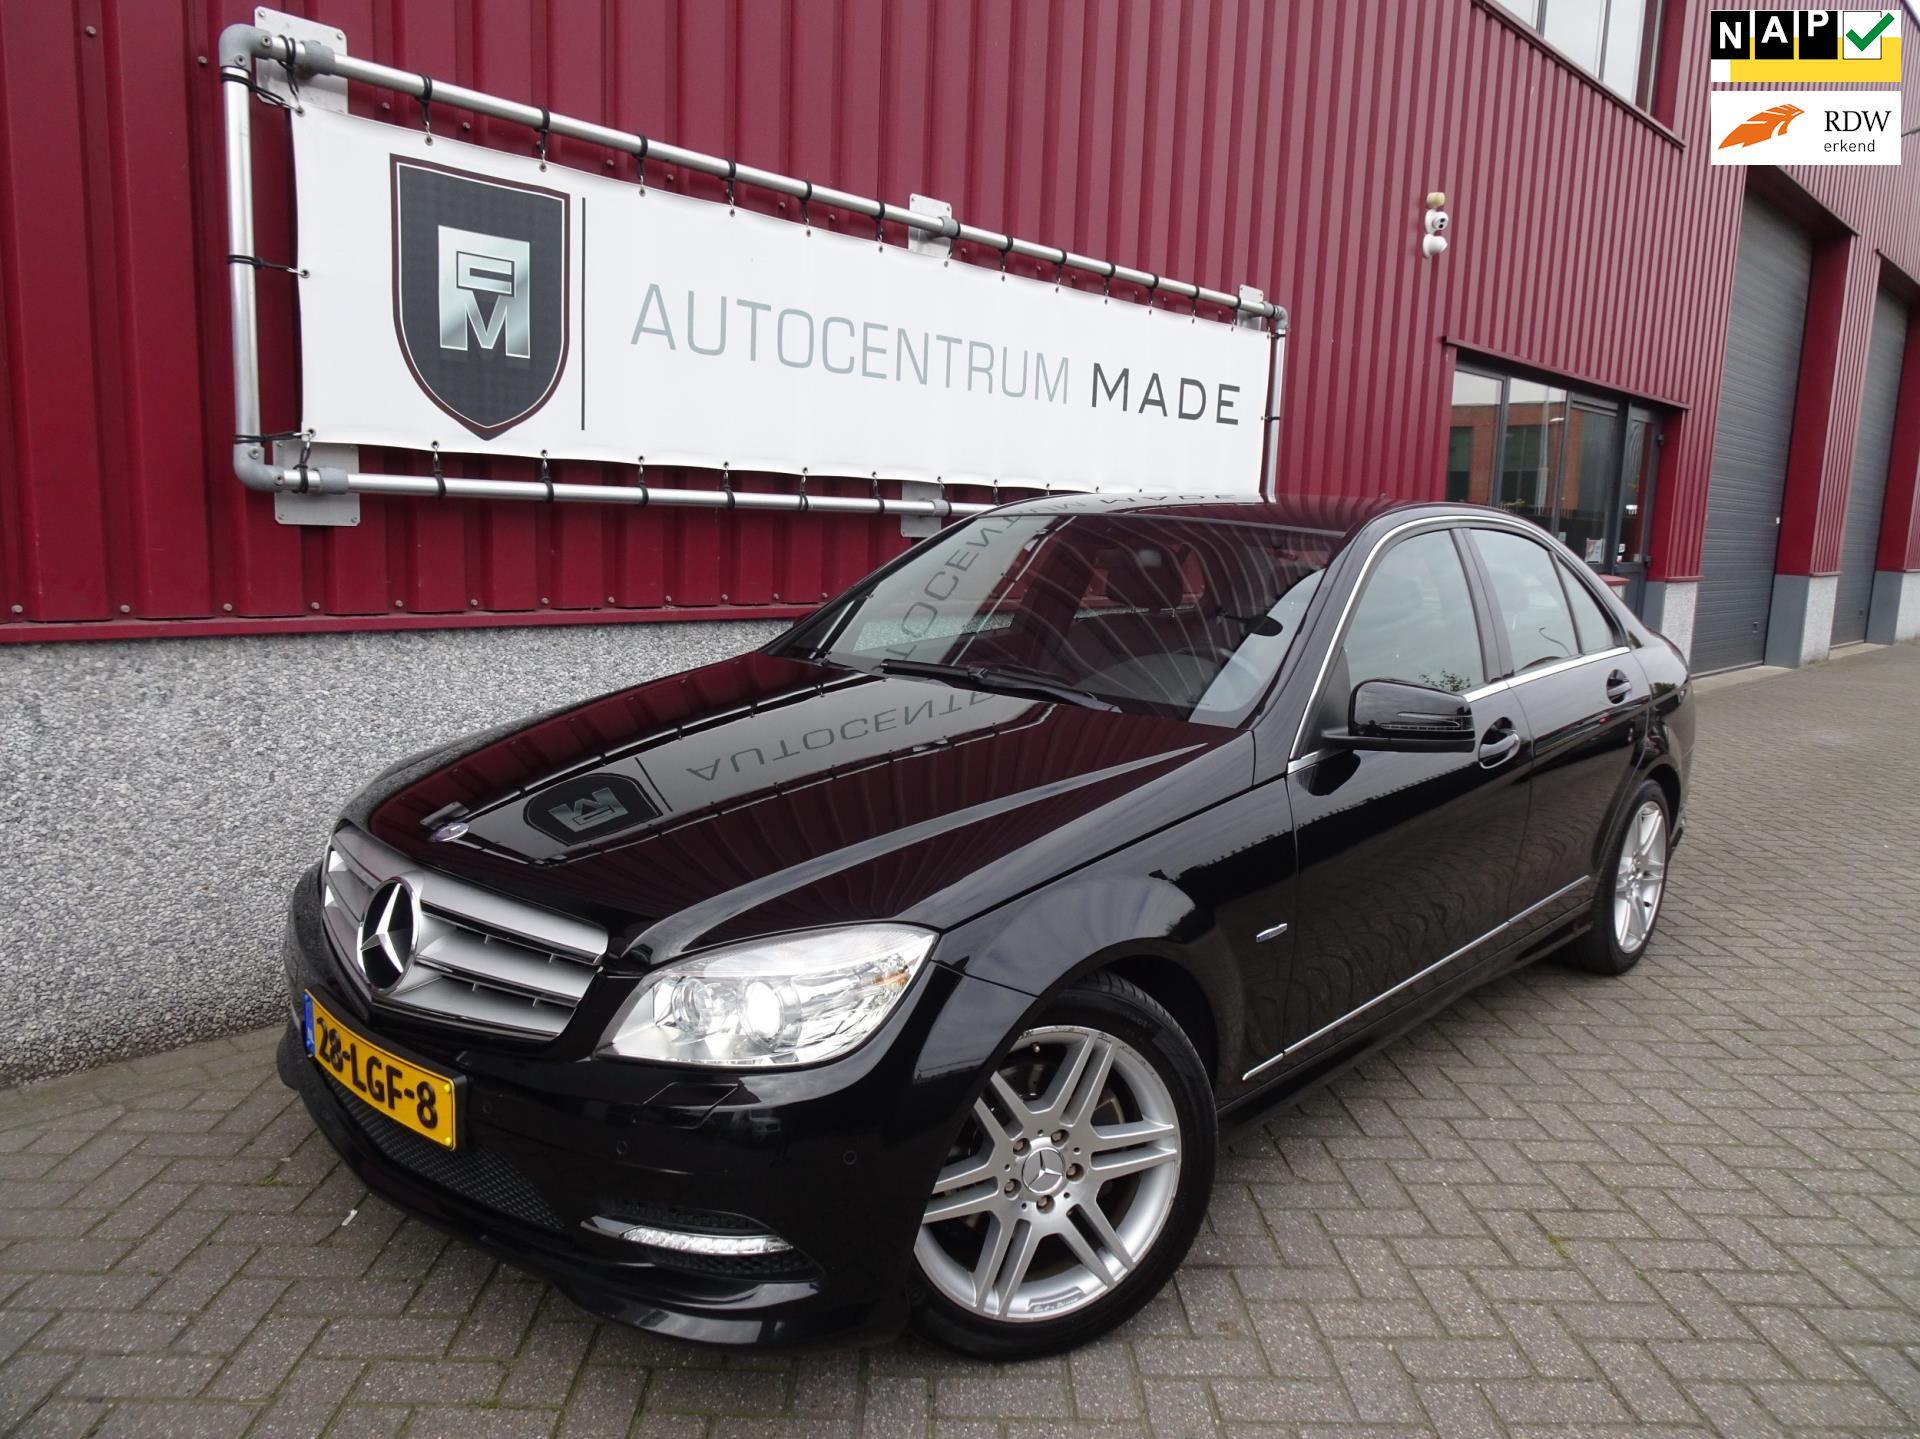 Mercedes-Benz C-klasse occasion - Auto Centrum Made